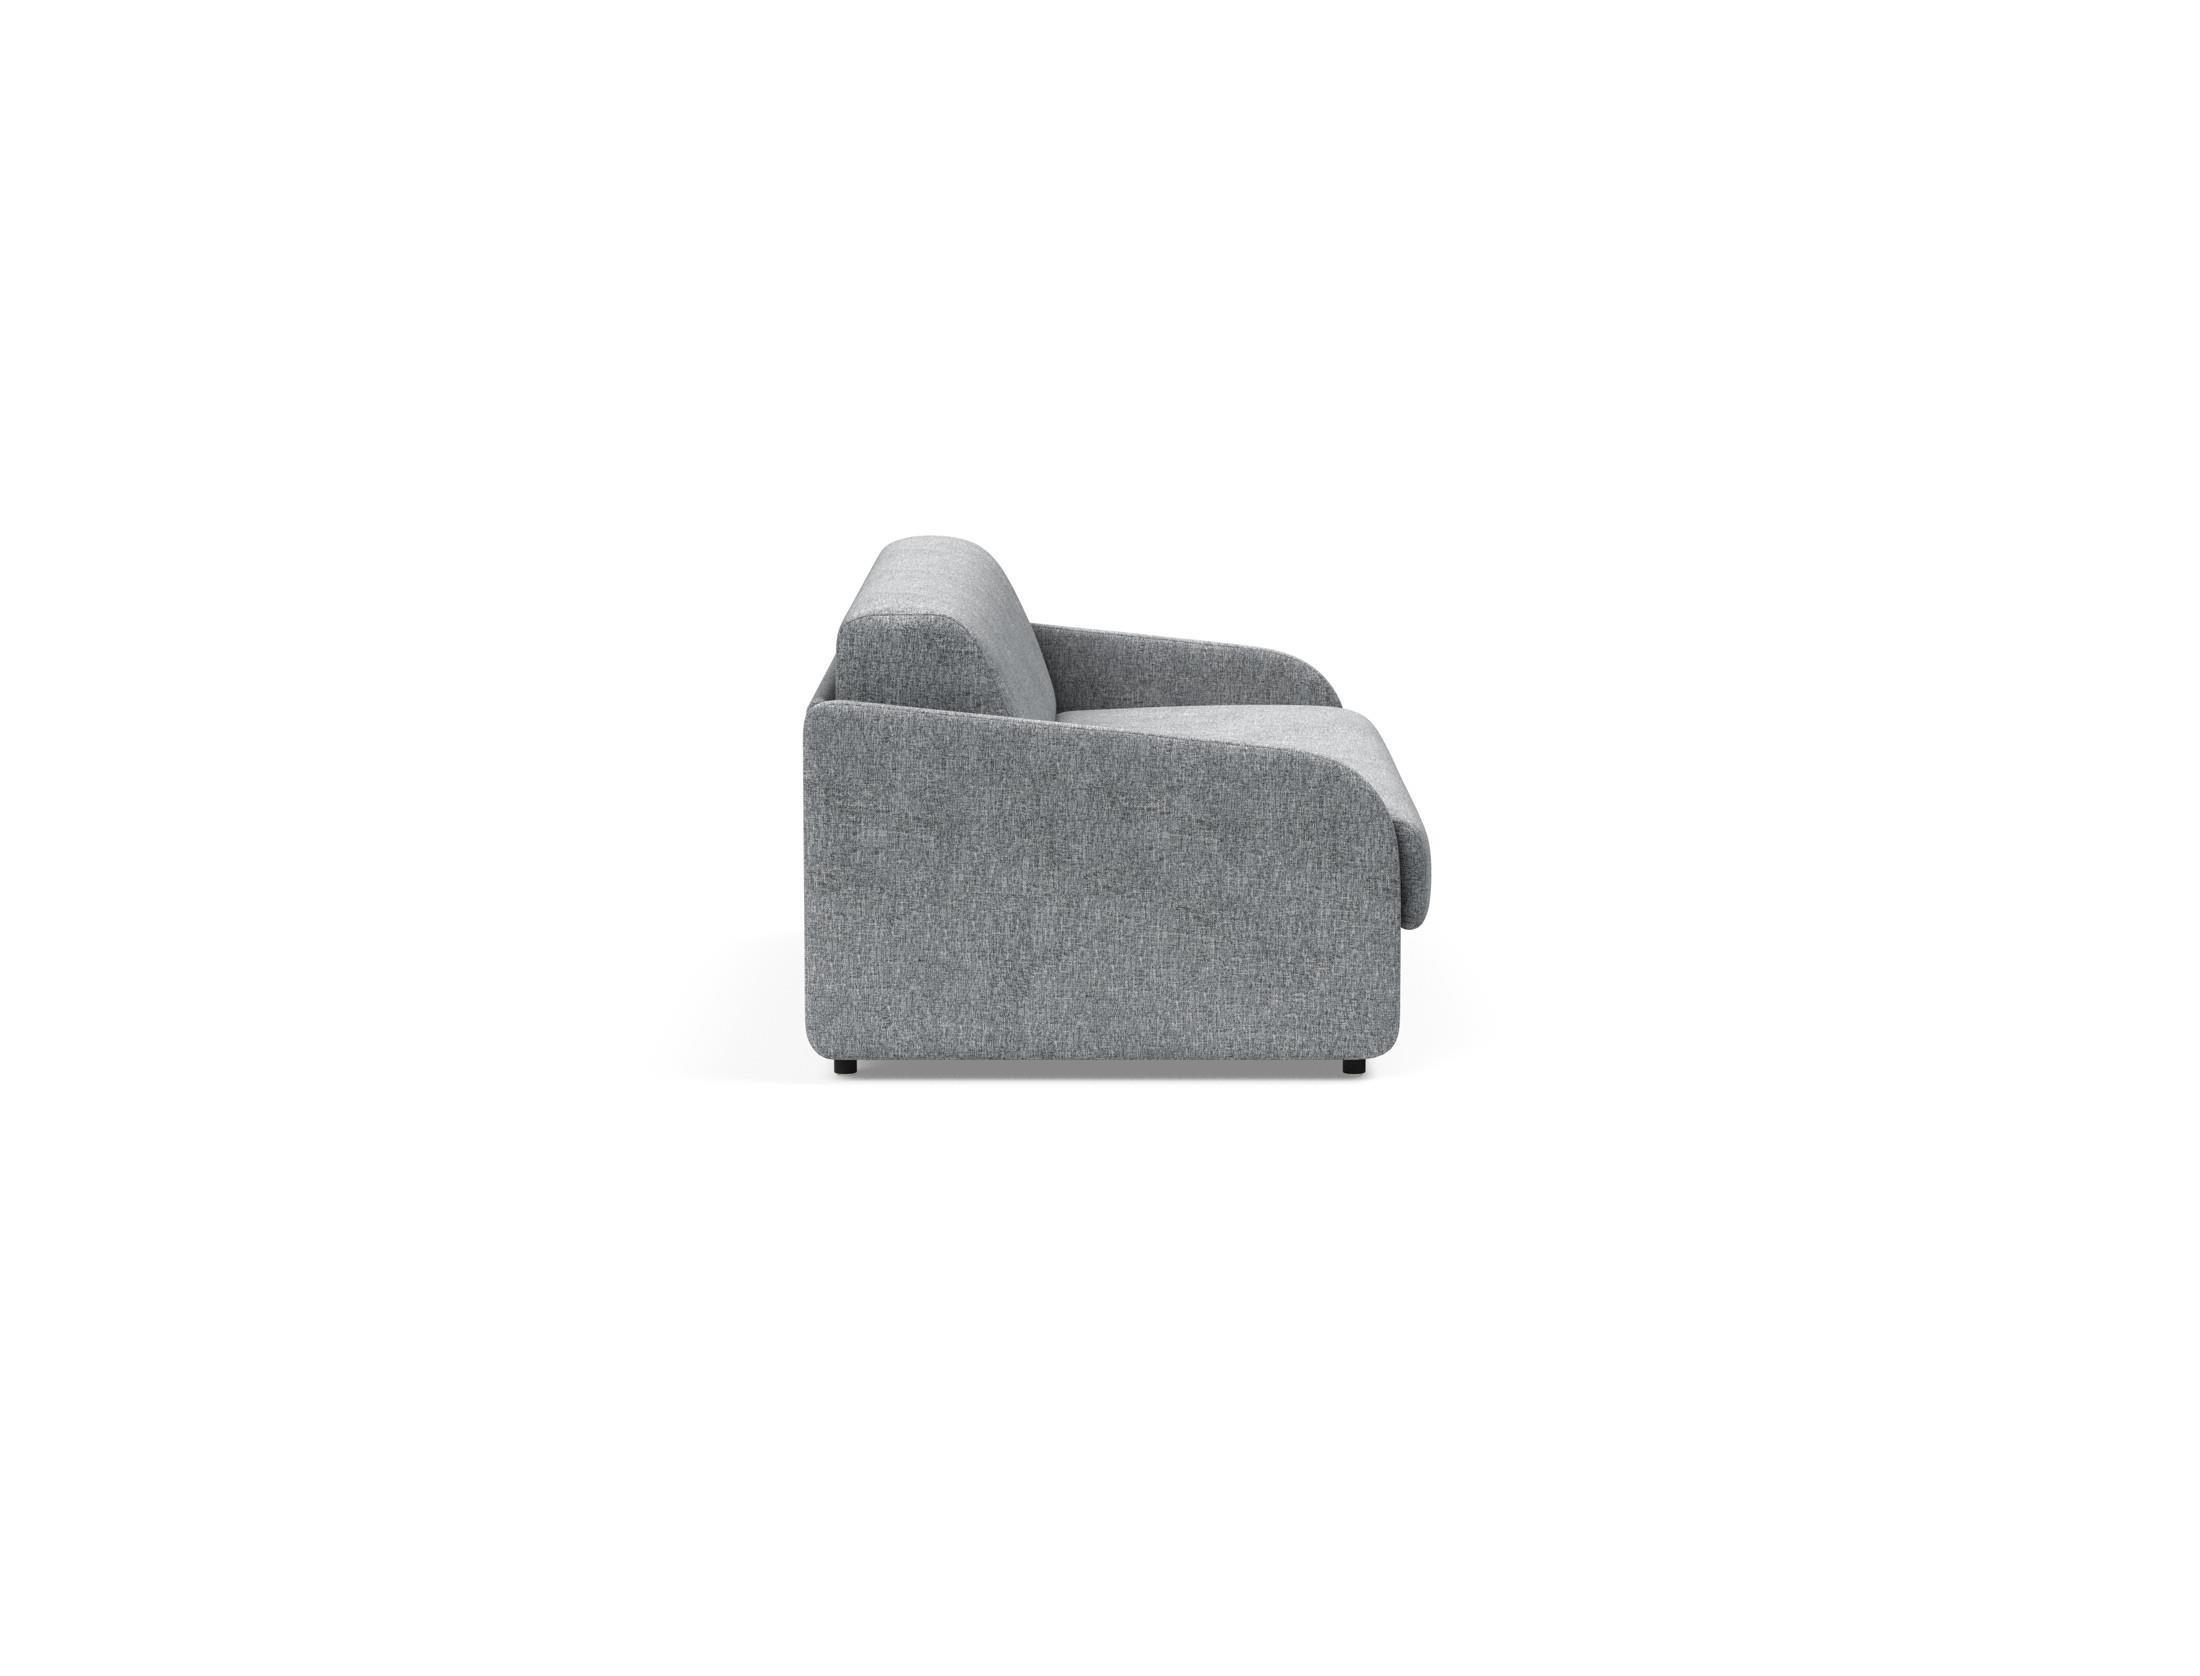 media/image/Eivor-140-Dual-Sofa-Bed-565-p3-web.jpg